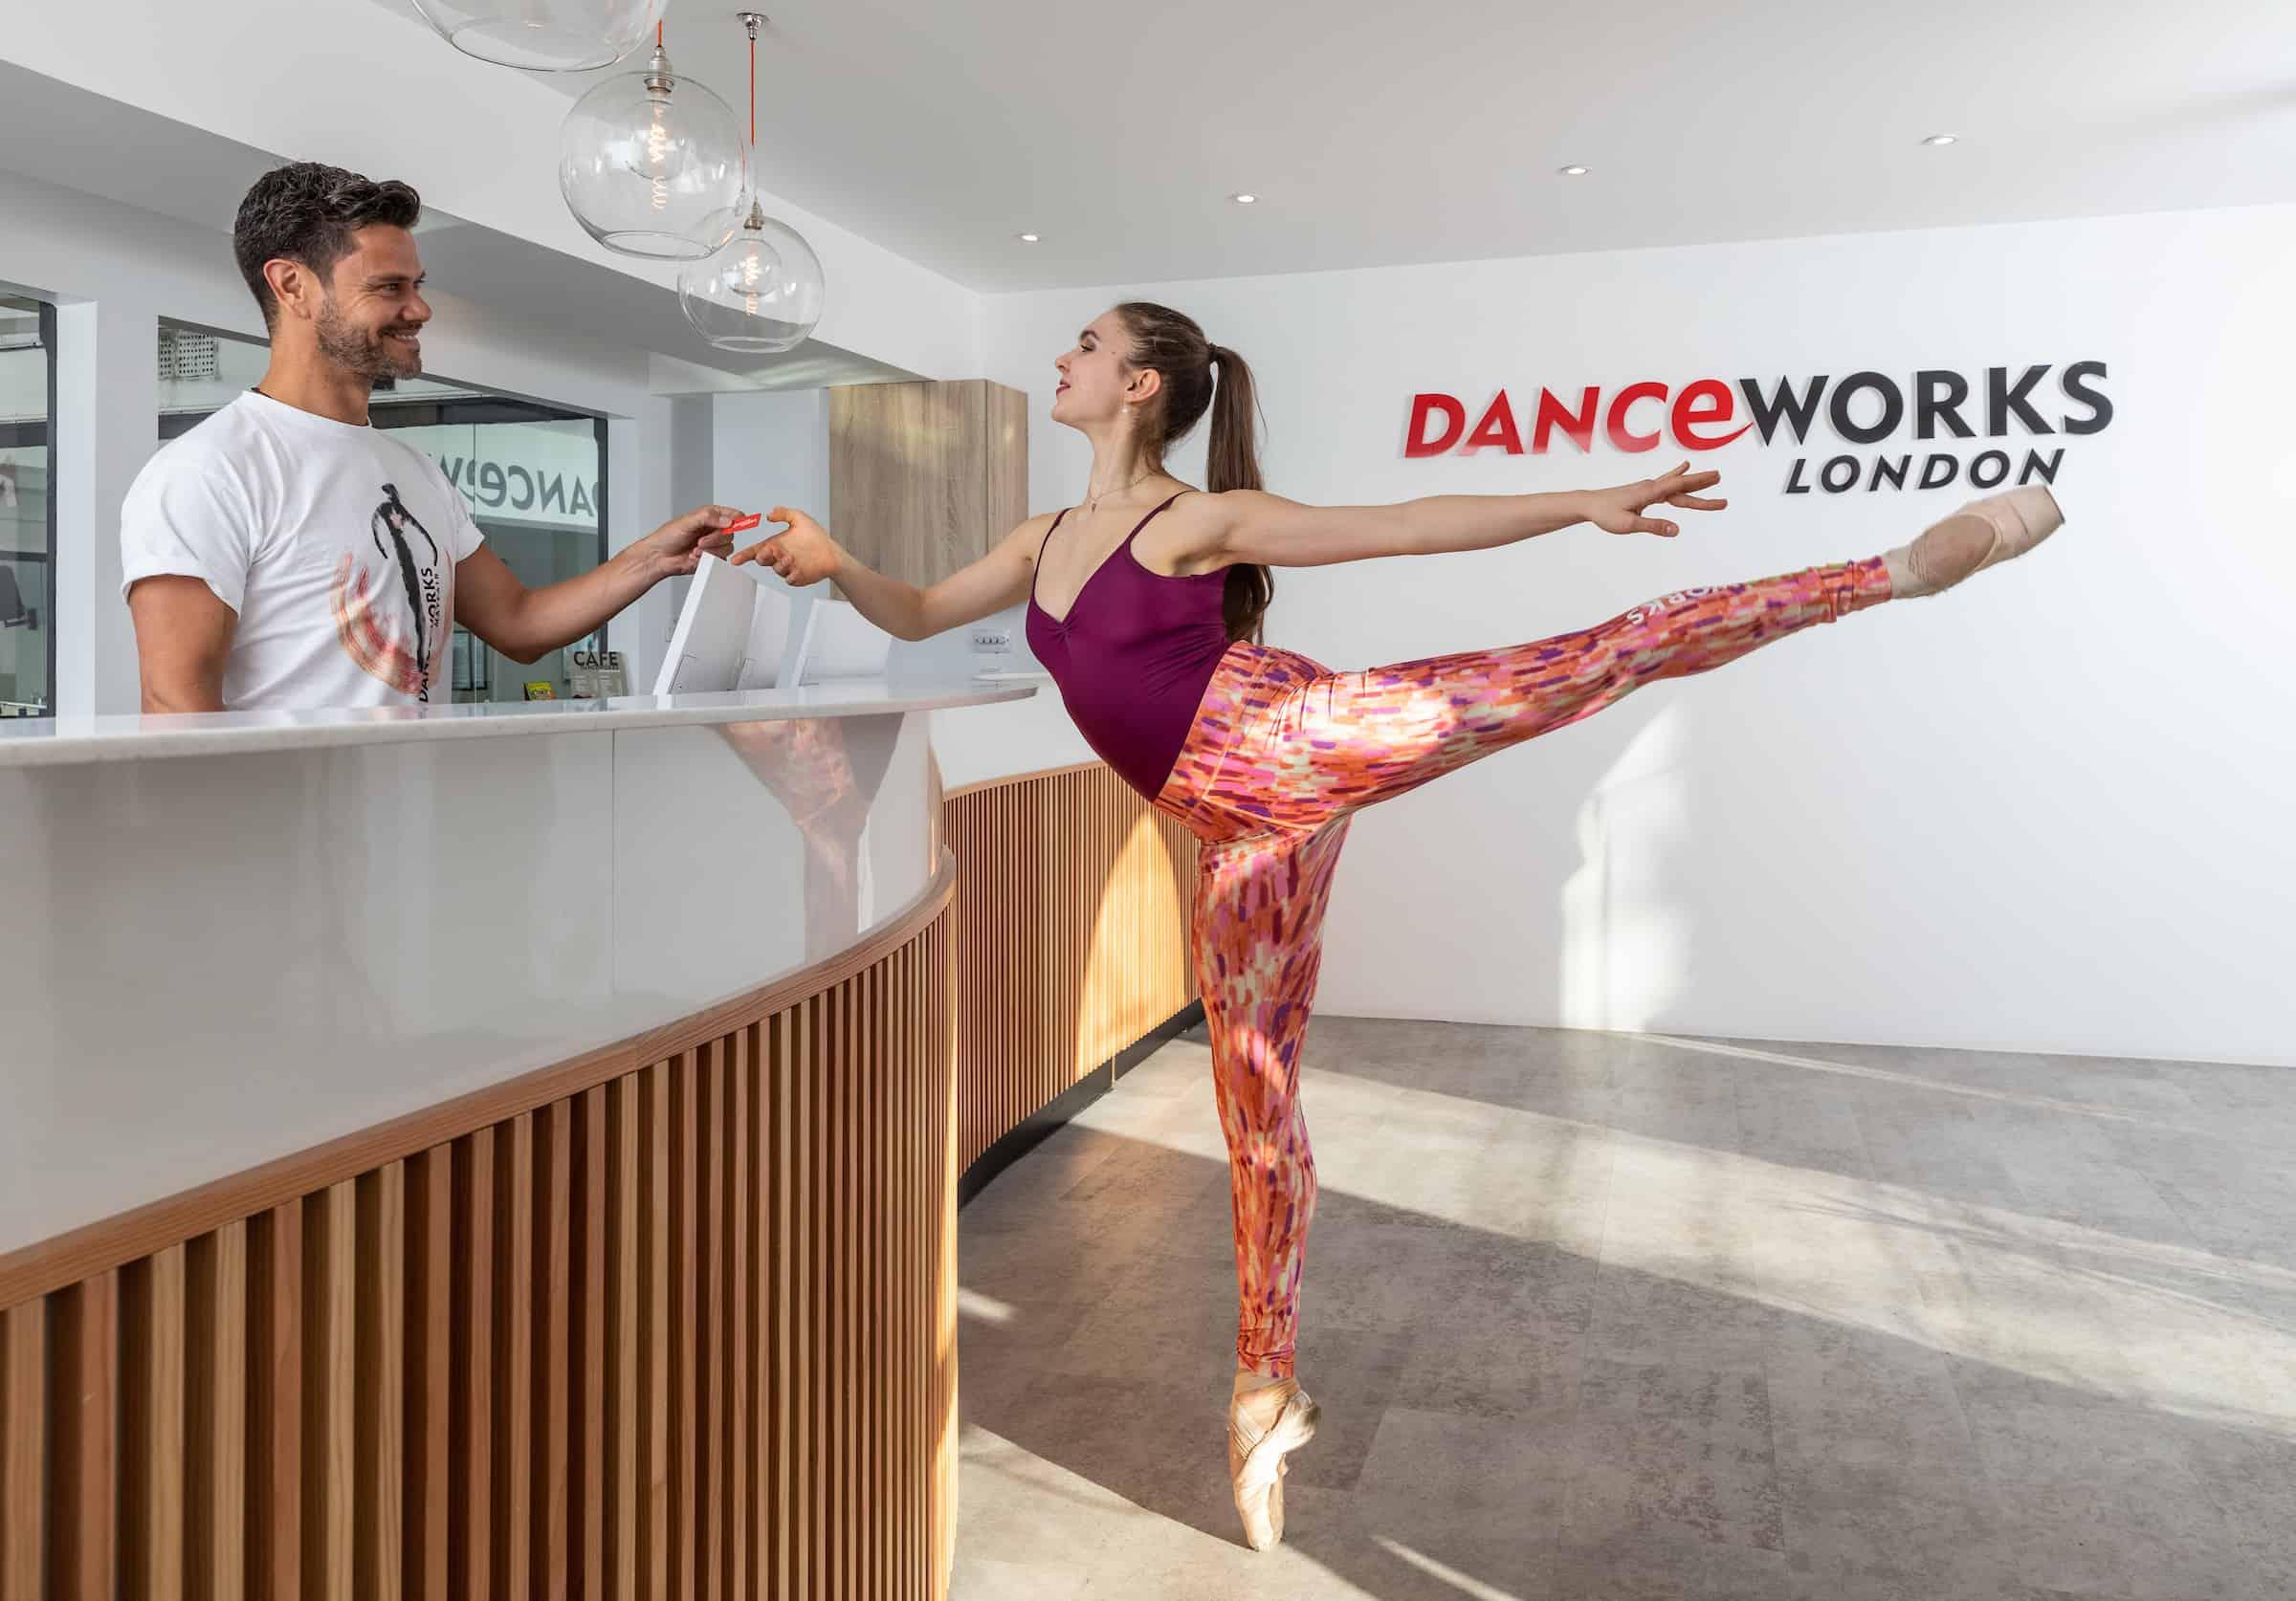 Danceworks Studio London